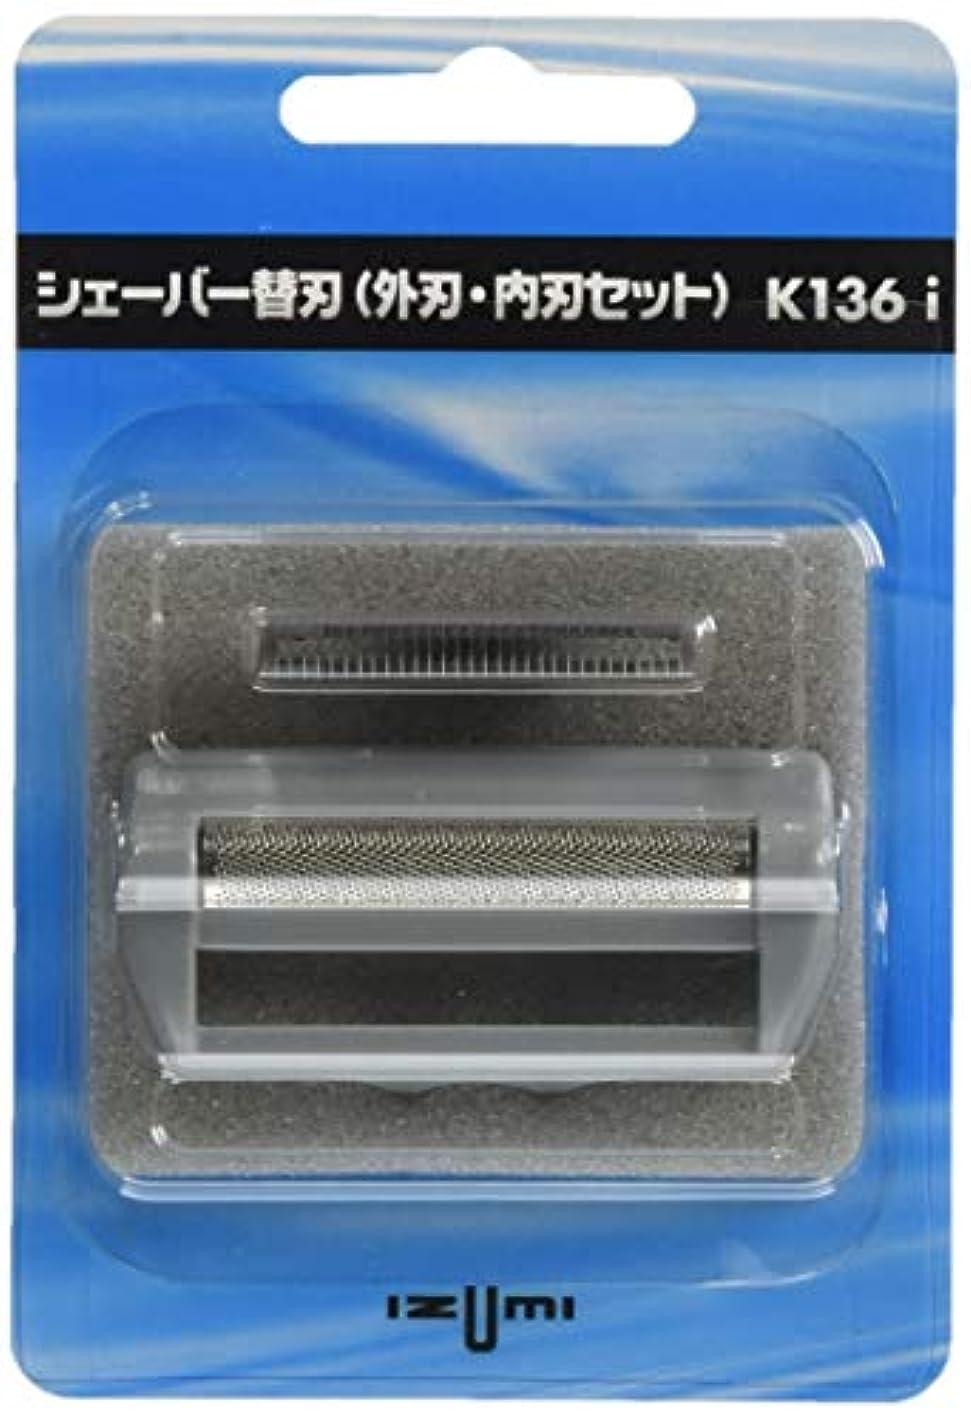 防水責任者バリーIZUMI(泉精器製作所) 往復式シェーバー用内刃?外刃セット 替刃 K136i